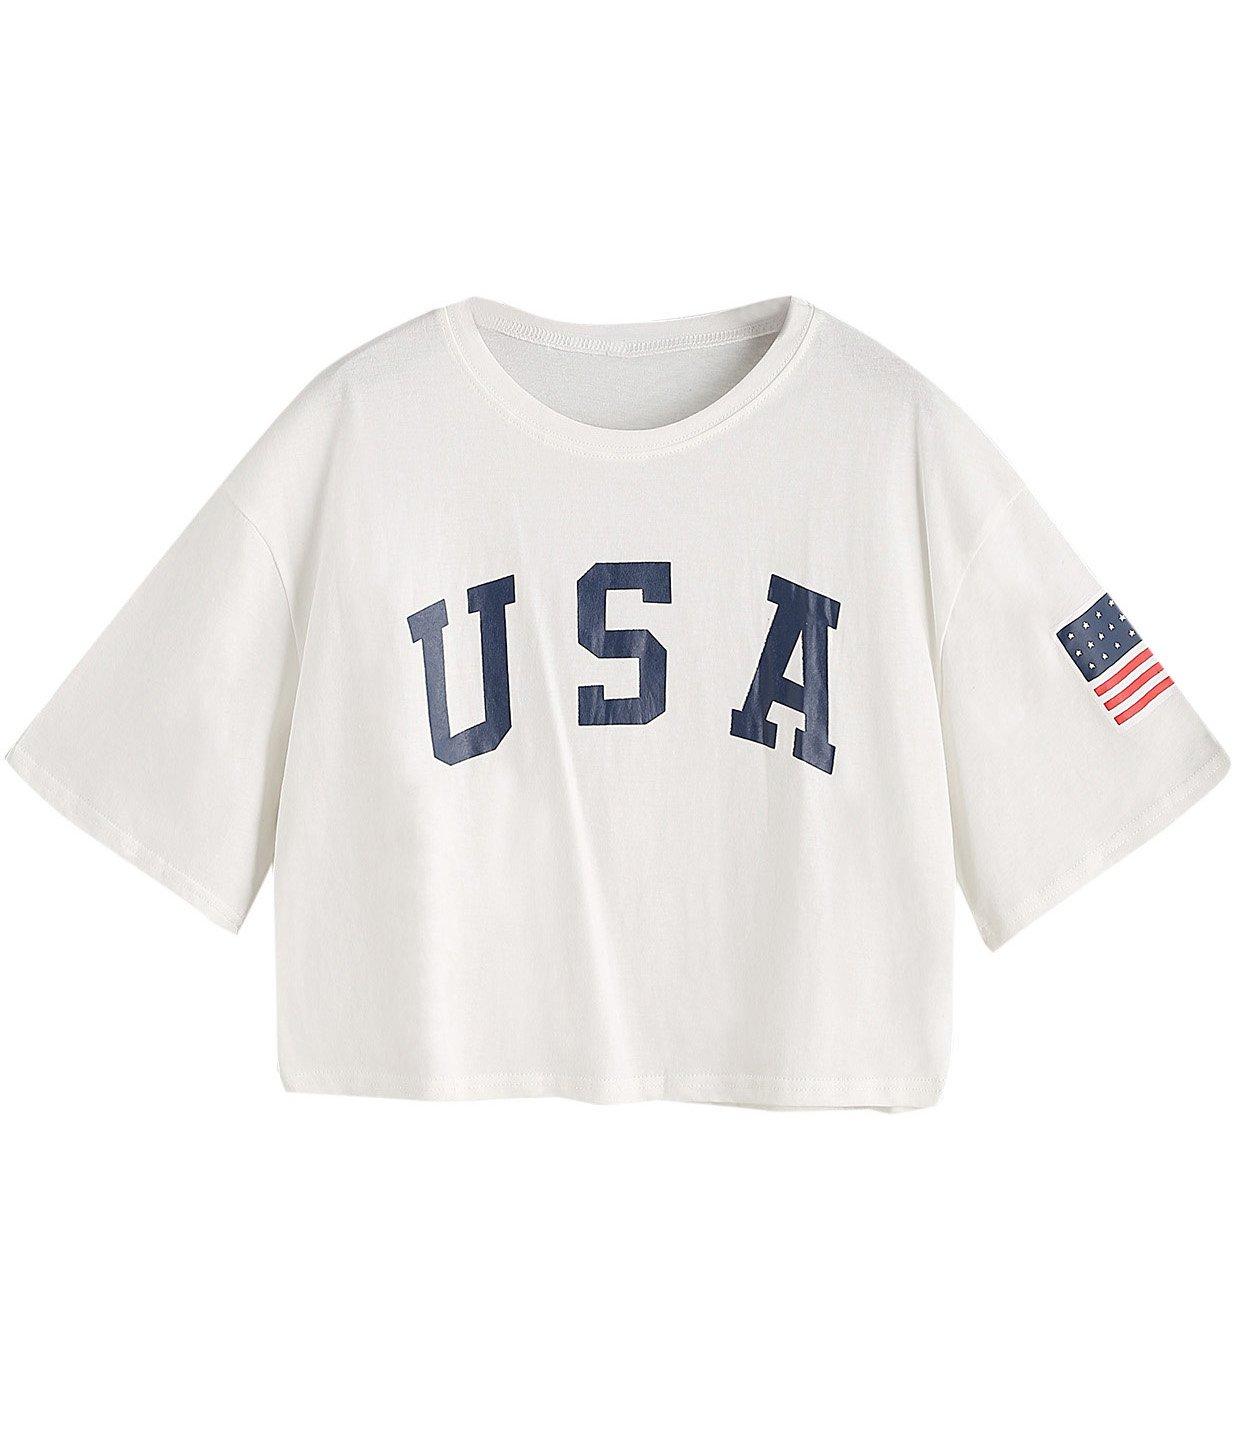 SweatyRocks Women's Letter Print Crop Tops Summer Short Sleeve T-shirt (X-Large, White)